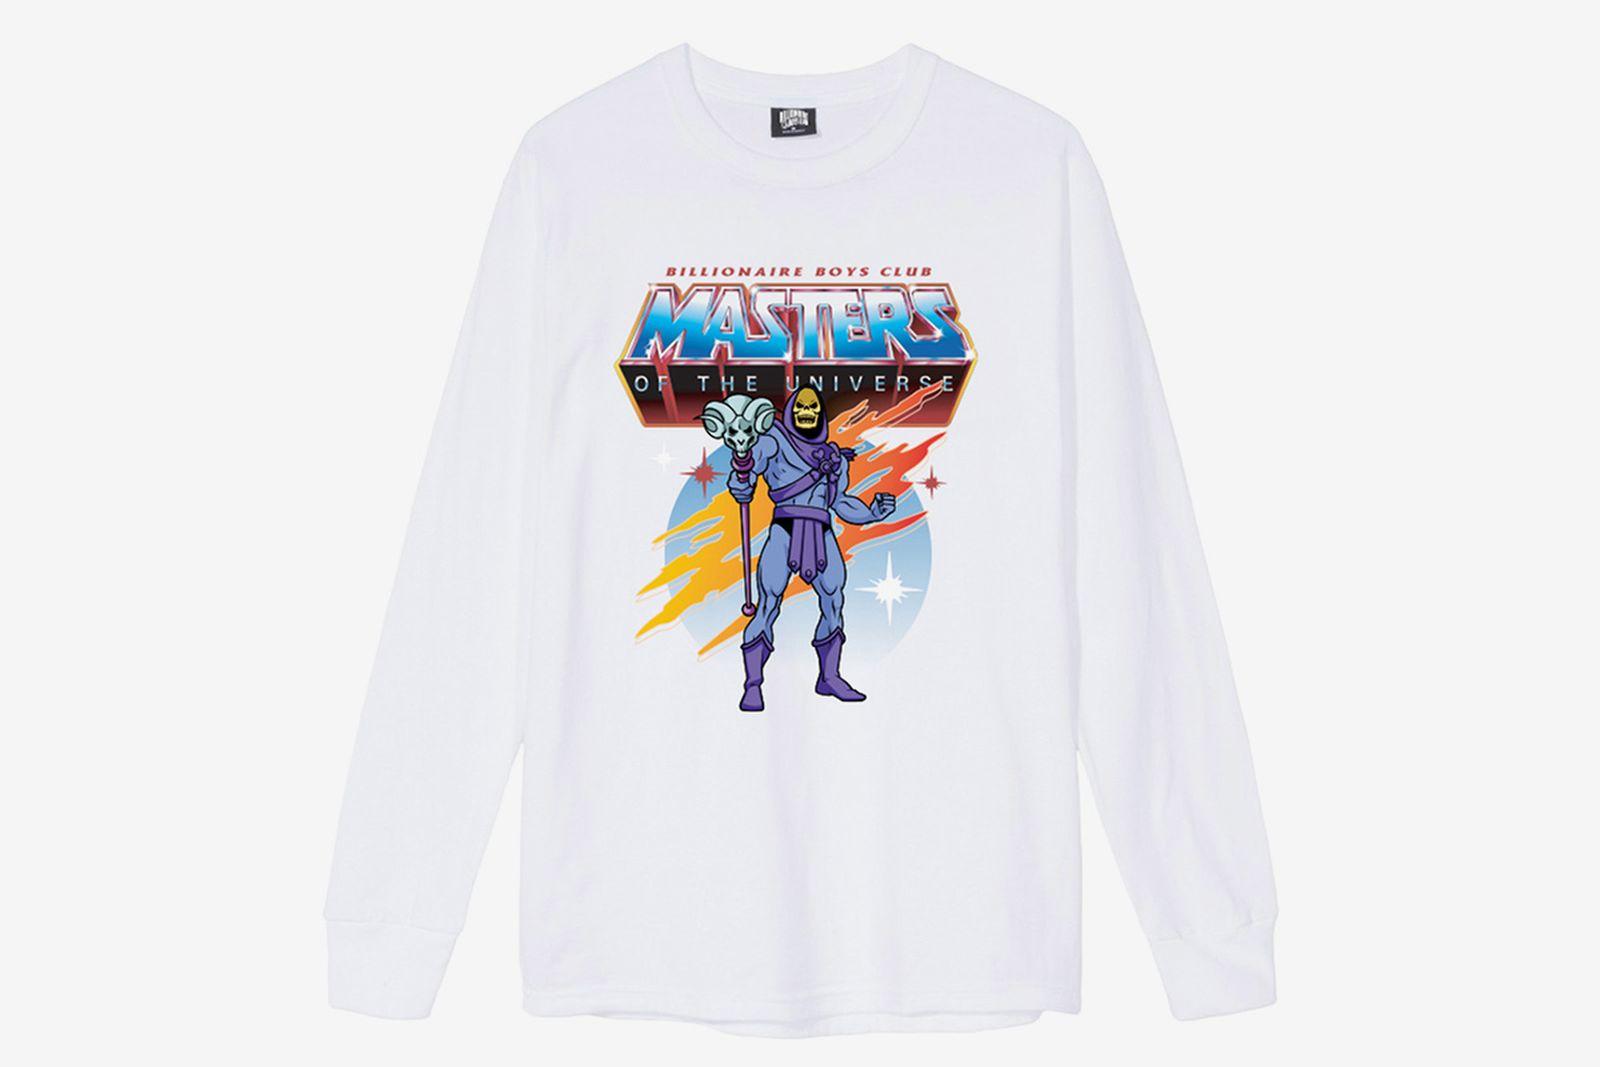 Billionaire Boys Club x Mattel's Spooky 'Master of the Universe' long sleeve white